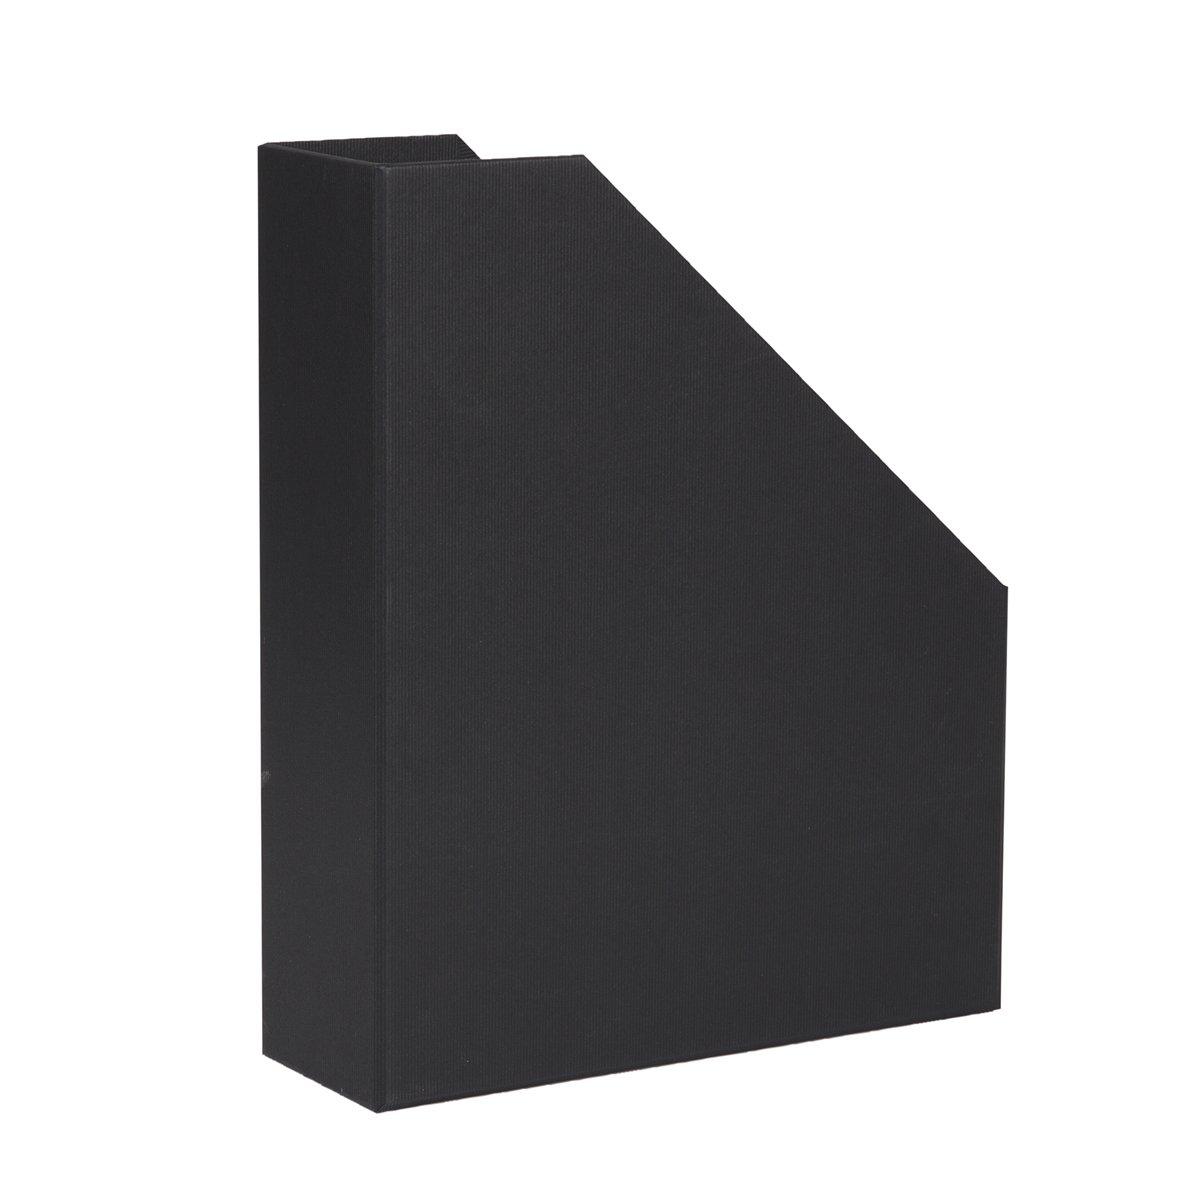 Rossler Soho-Raccoglitore portariviste, formato A4, 85 mm rosso Rssler Papier 1318452360